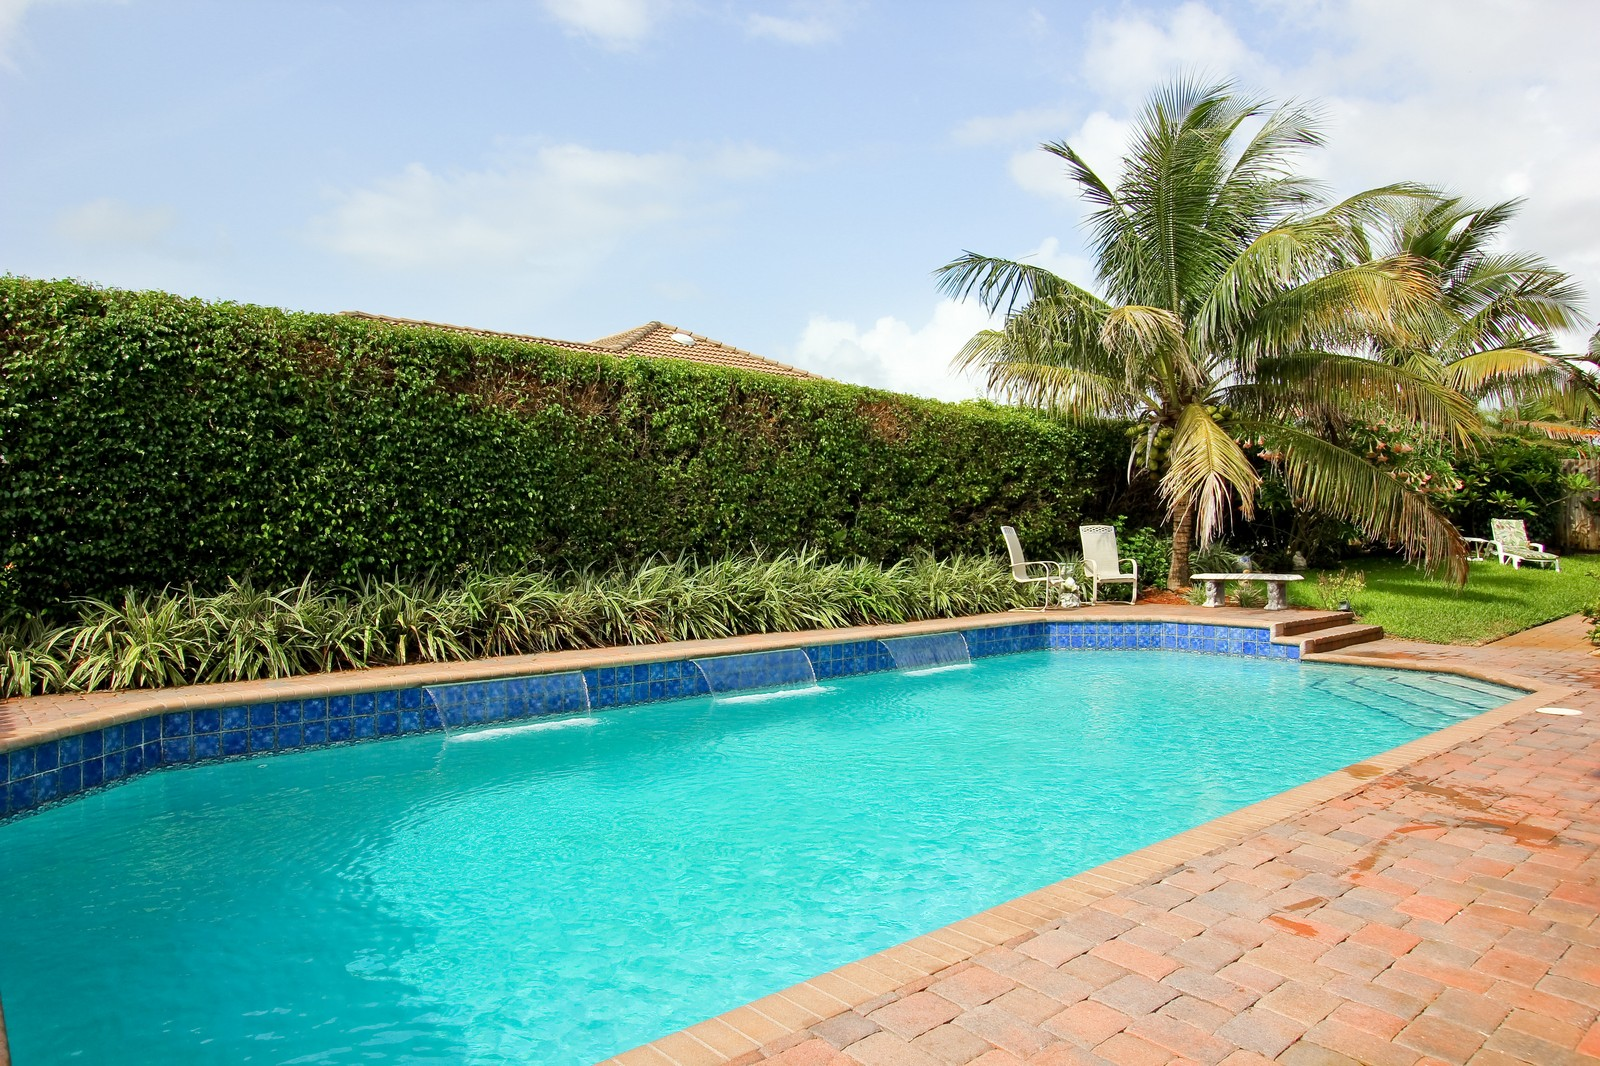 Real Estate Photography - 430 N. Lyra Circle, Juno Beach, FL, 33408 - Pool